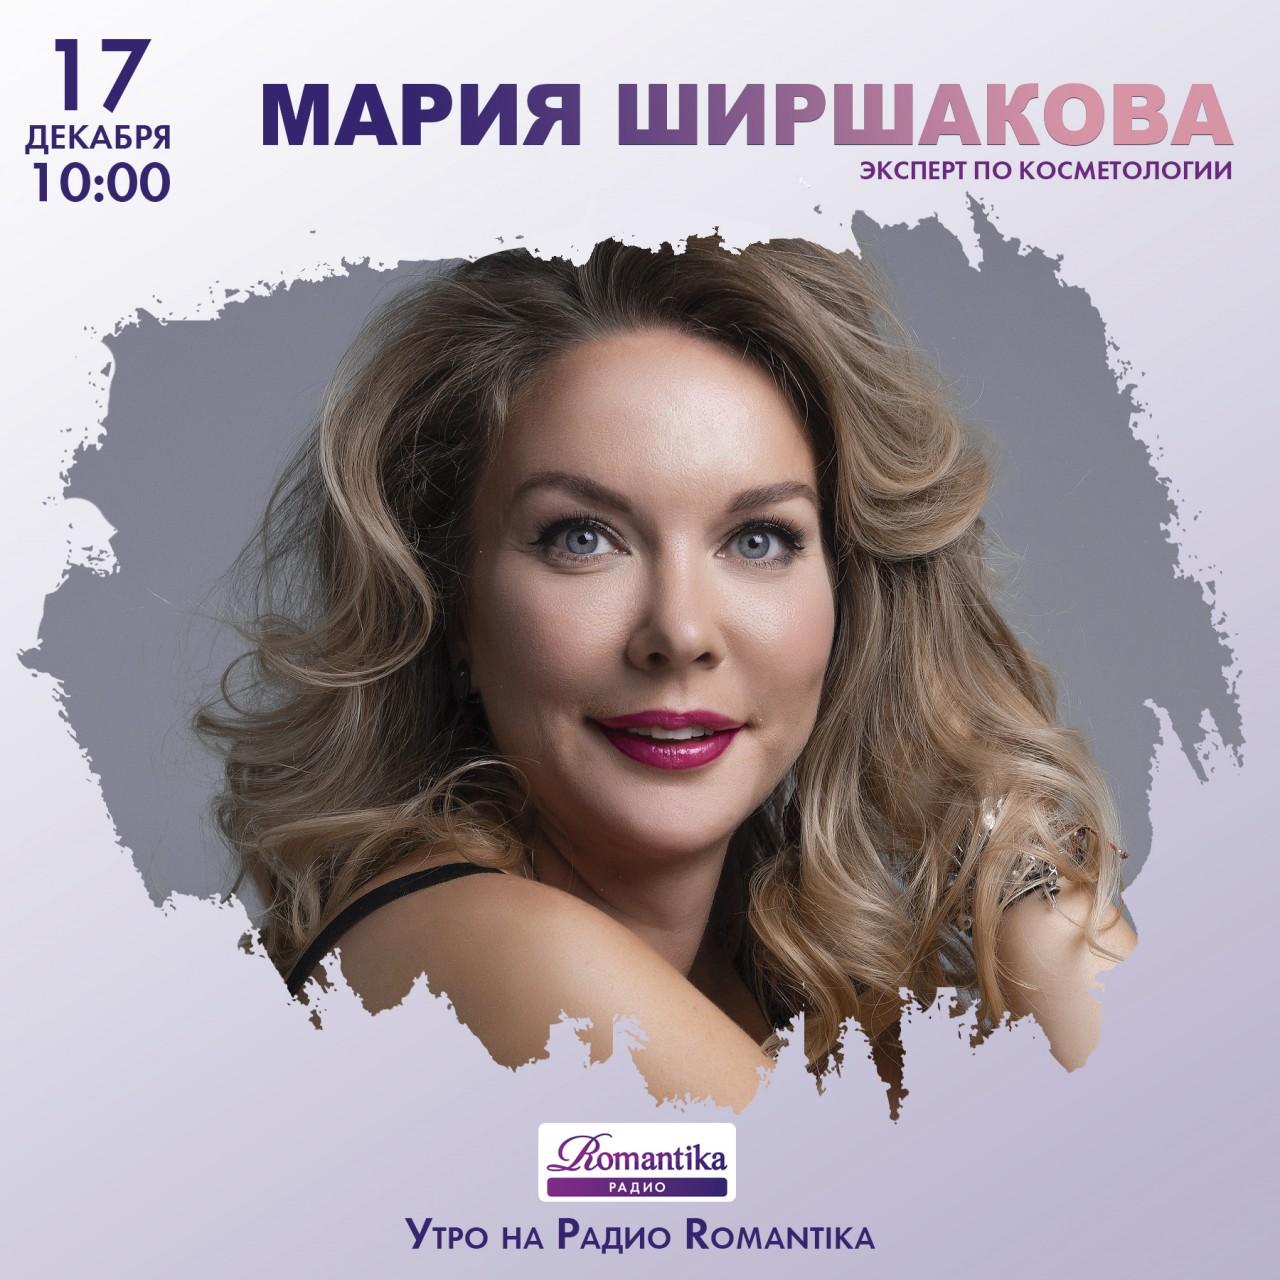 Радио Romantika: 17 декабря …